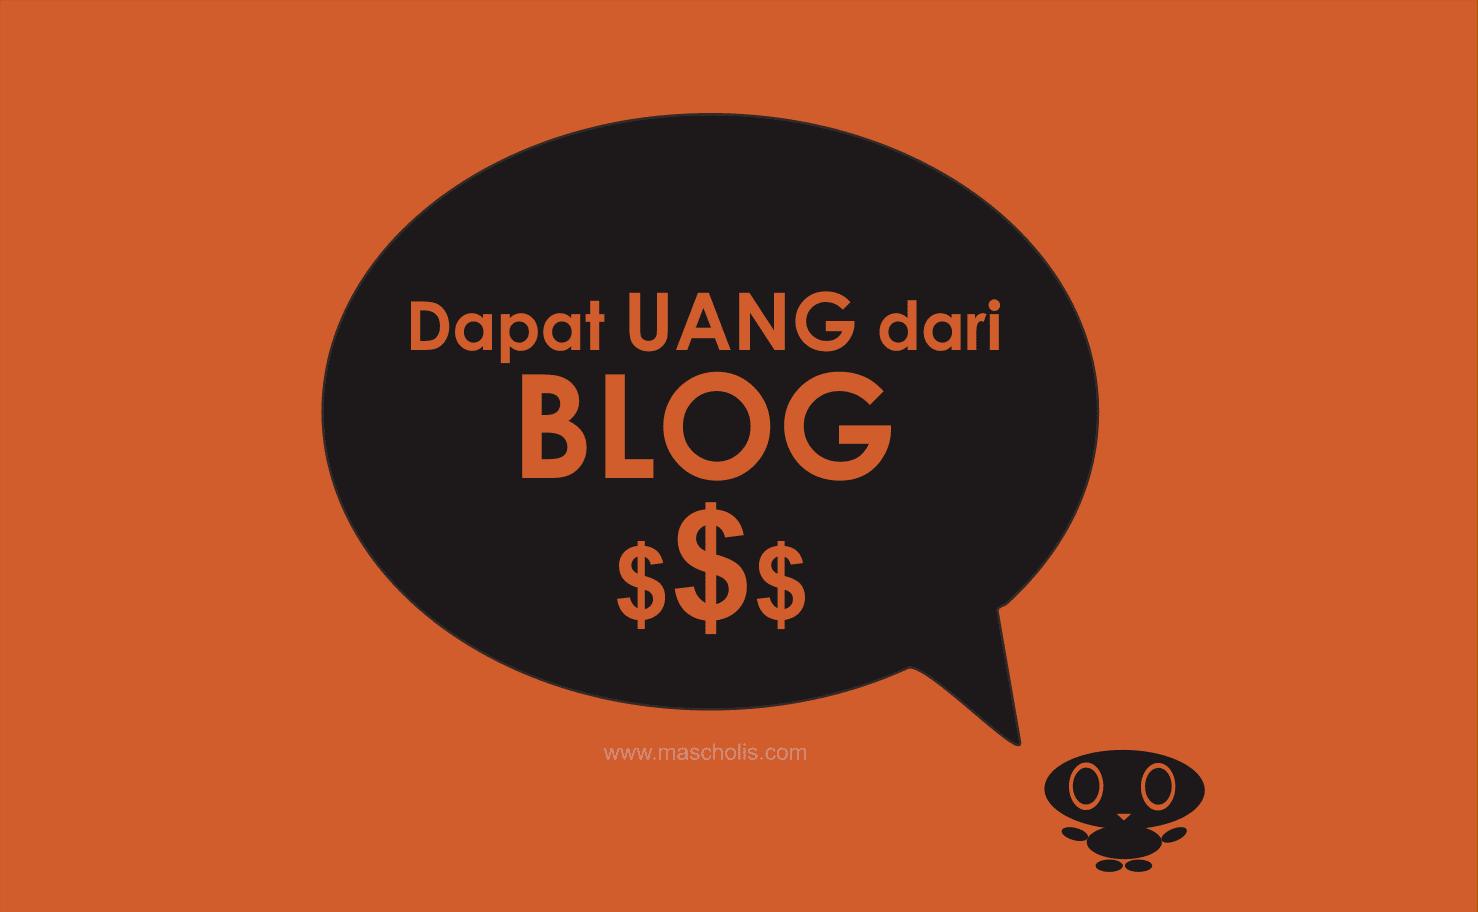 Panduan Lengkap Belajar Ngeblog untuk Pemula